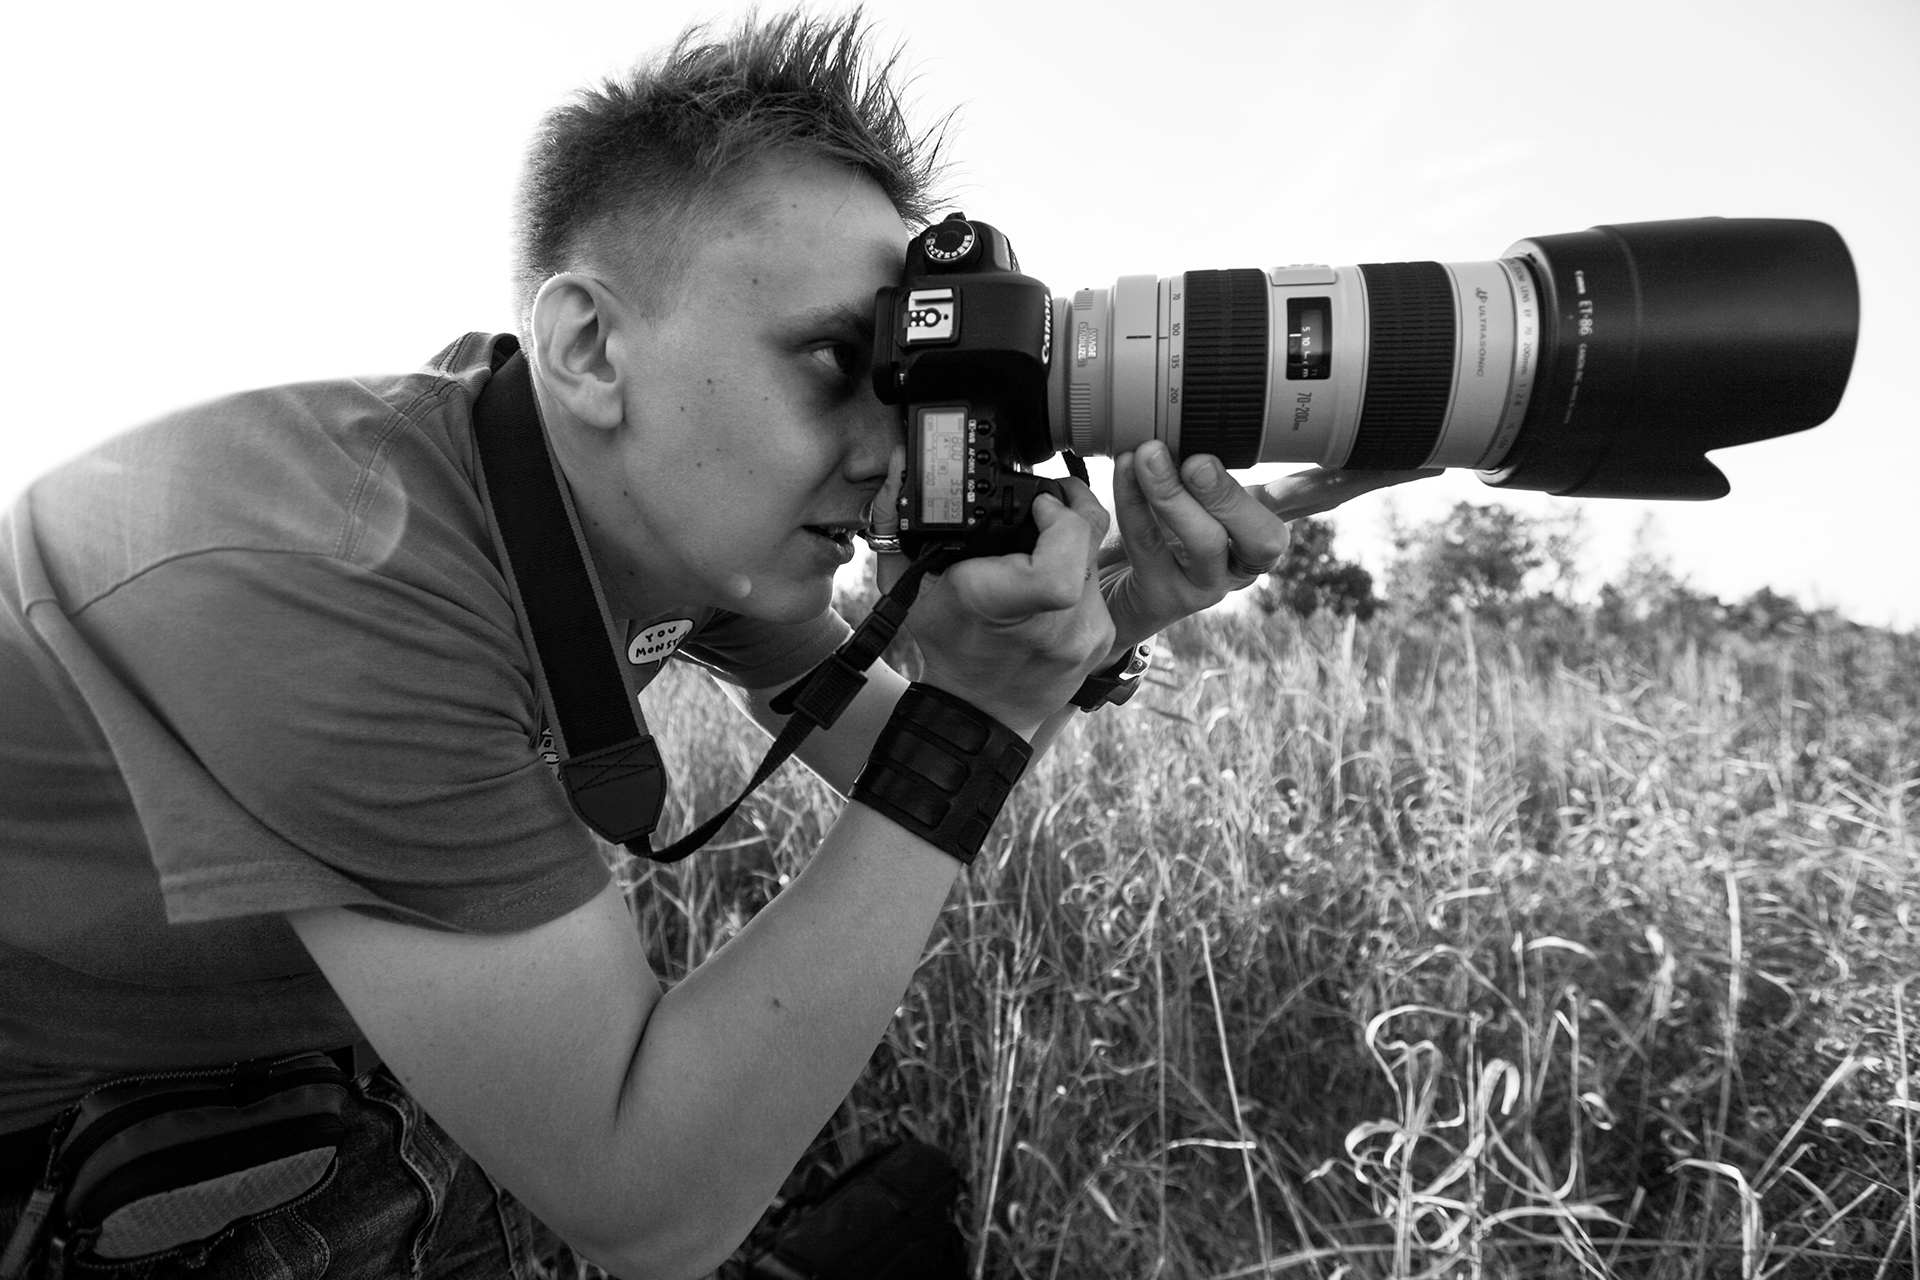 Photographer Ivan Bessedin